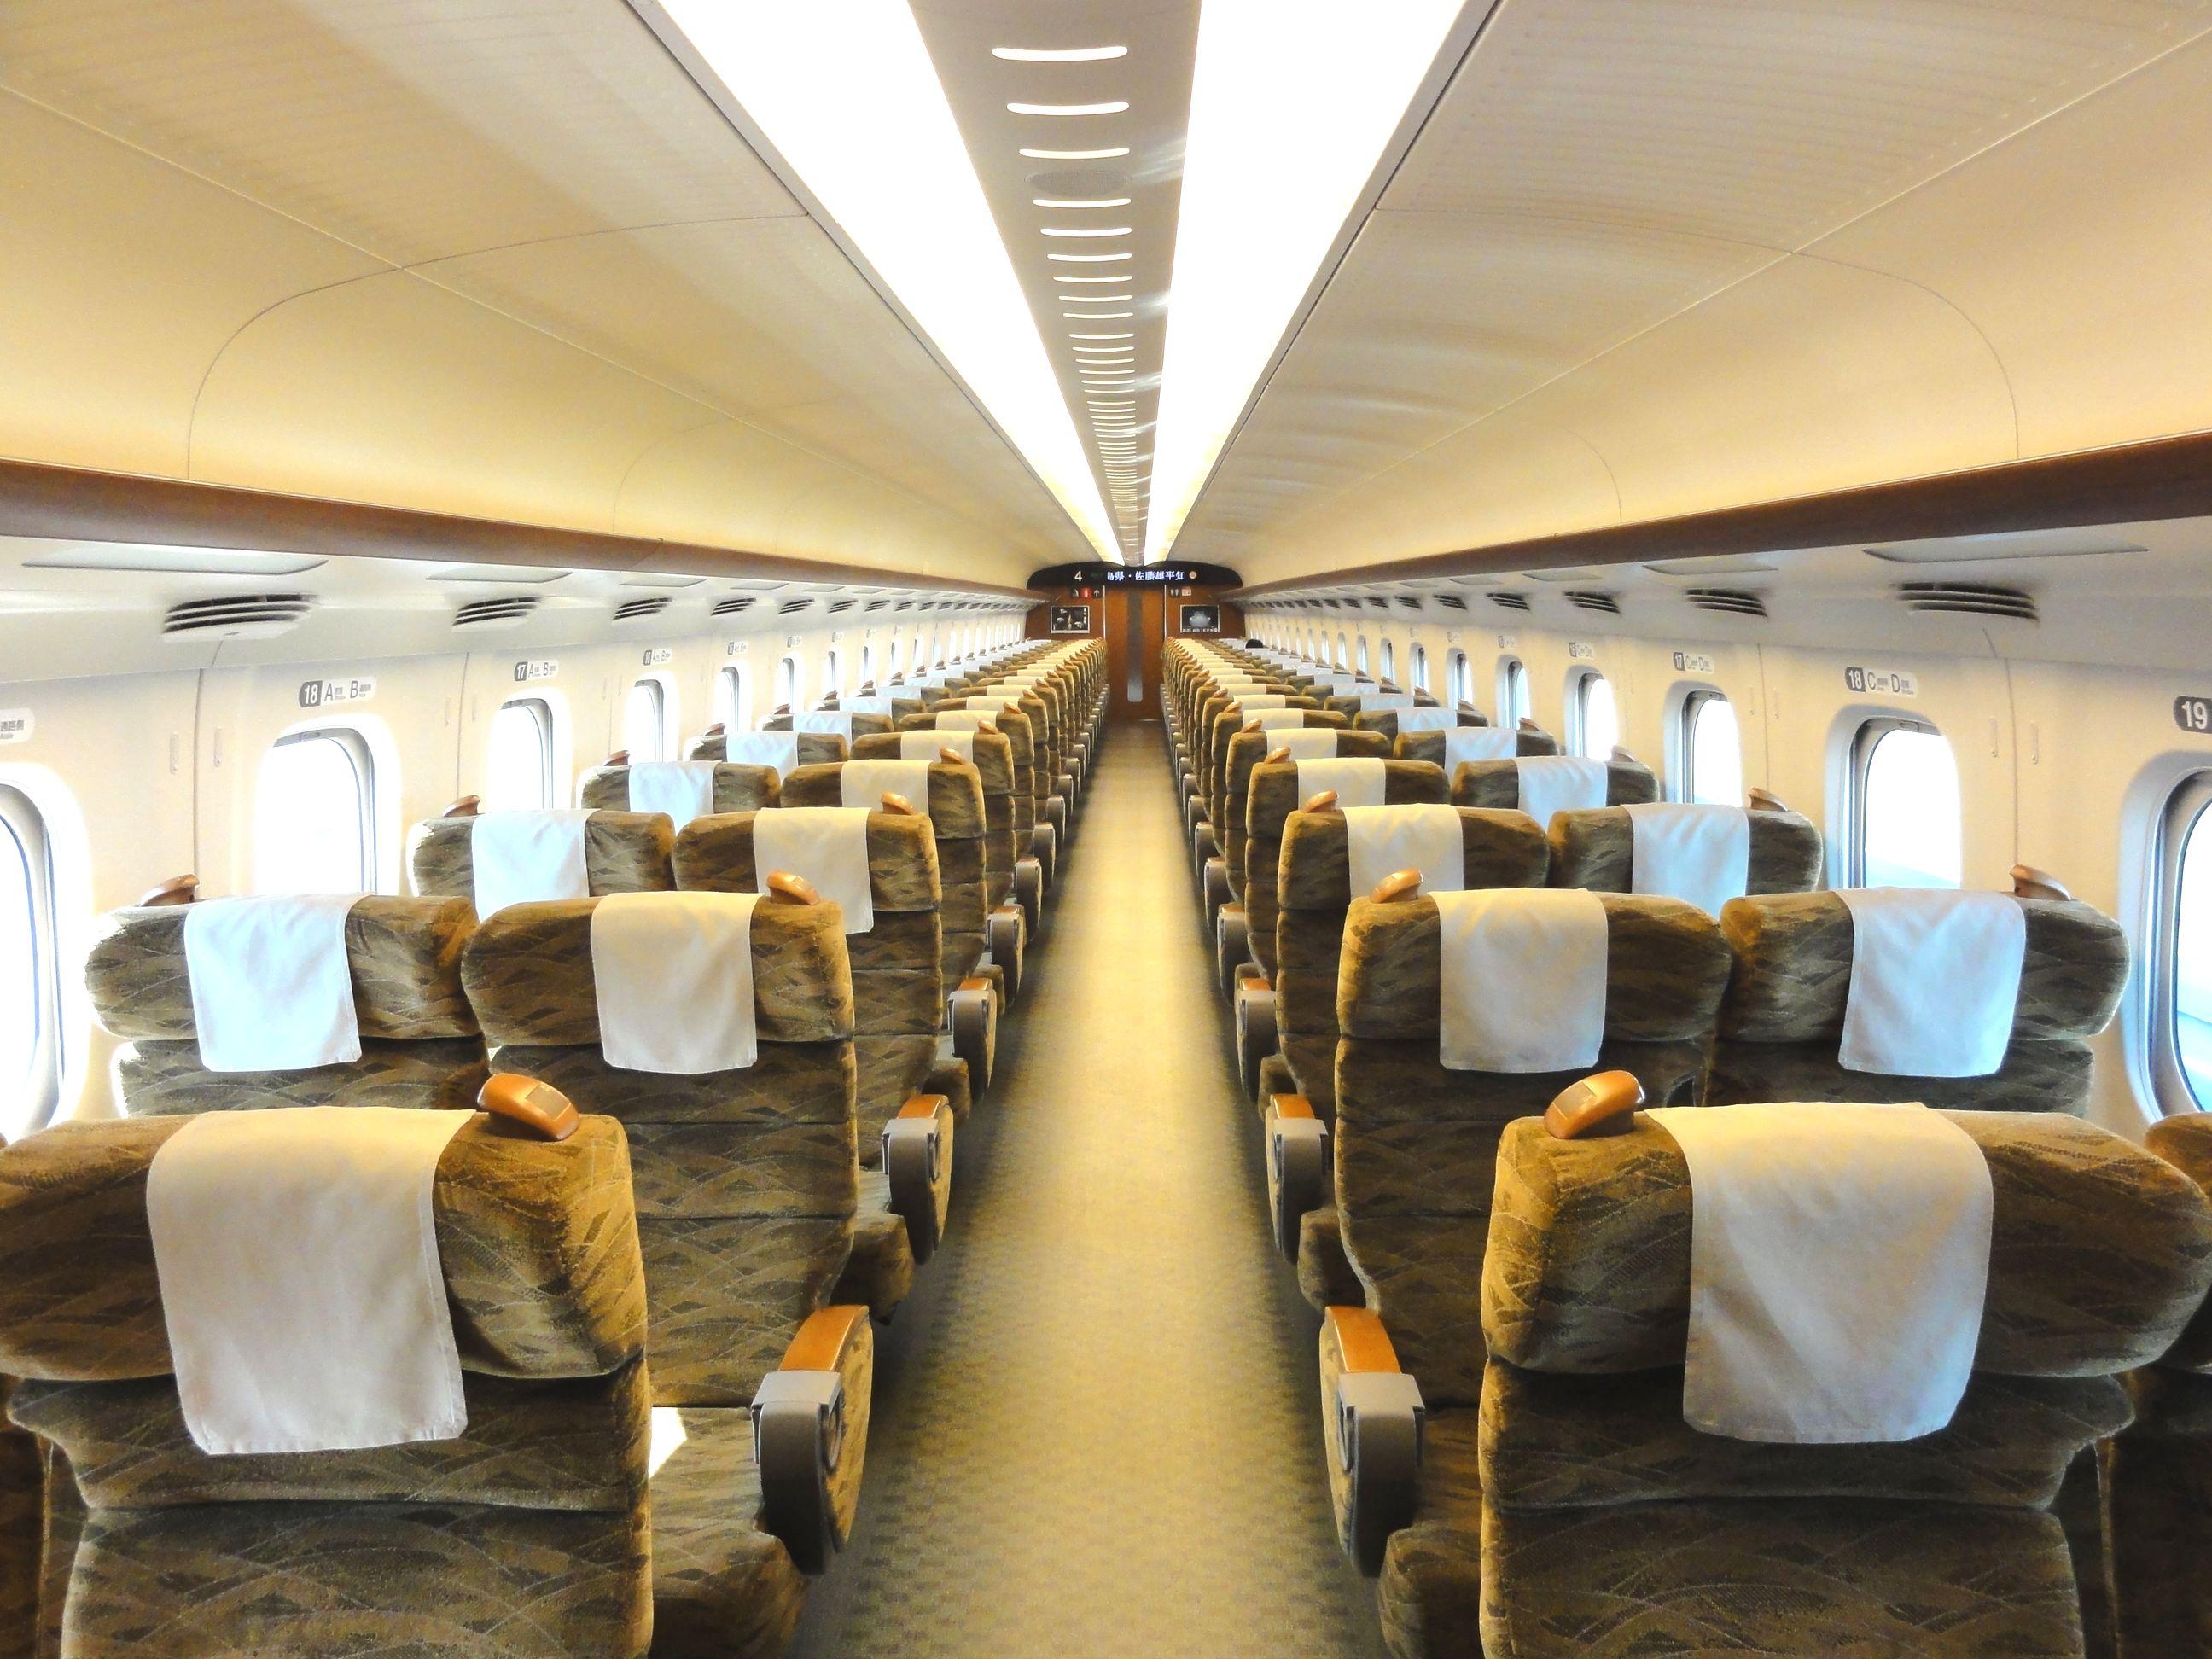 FileShinkansen N700 Series 787 8000 Inside